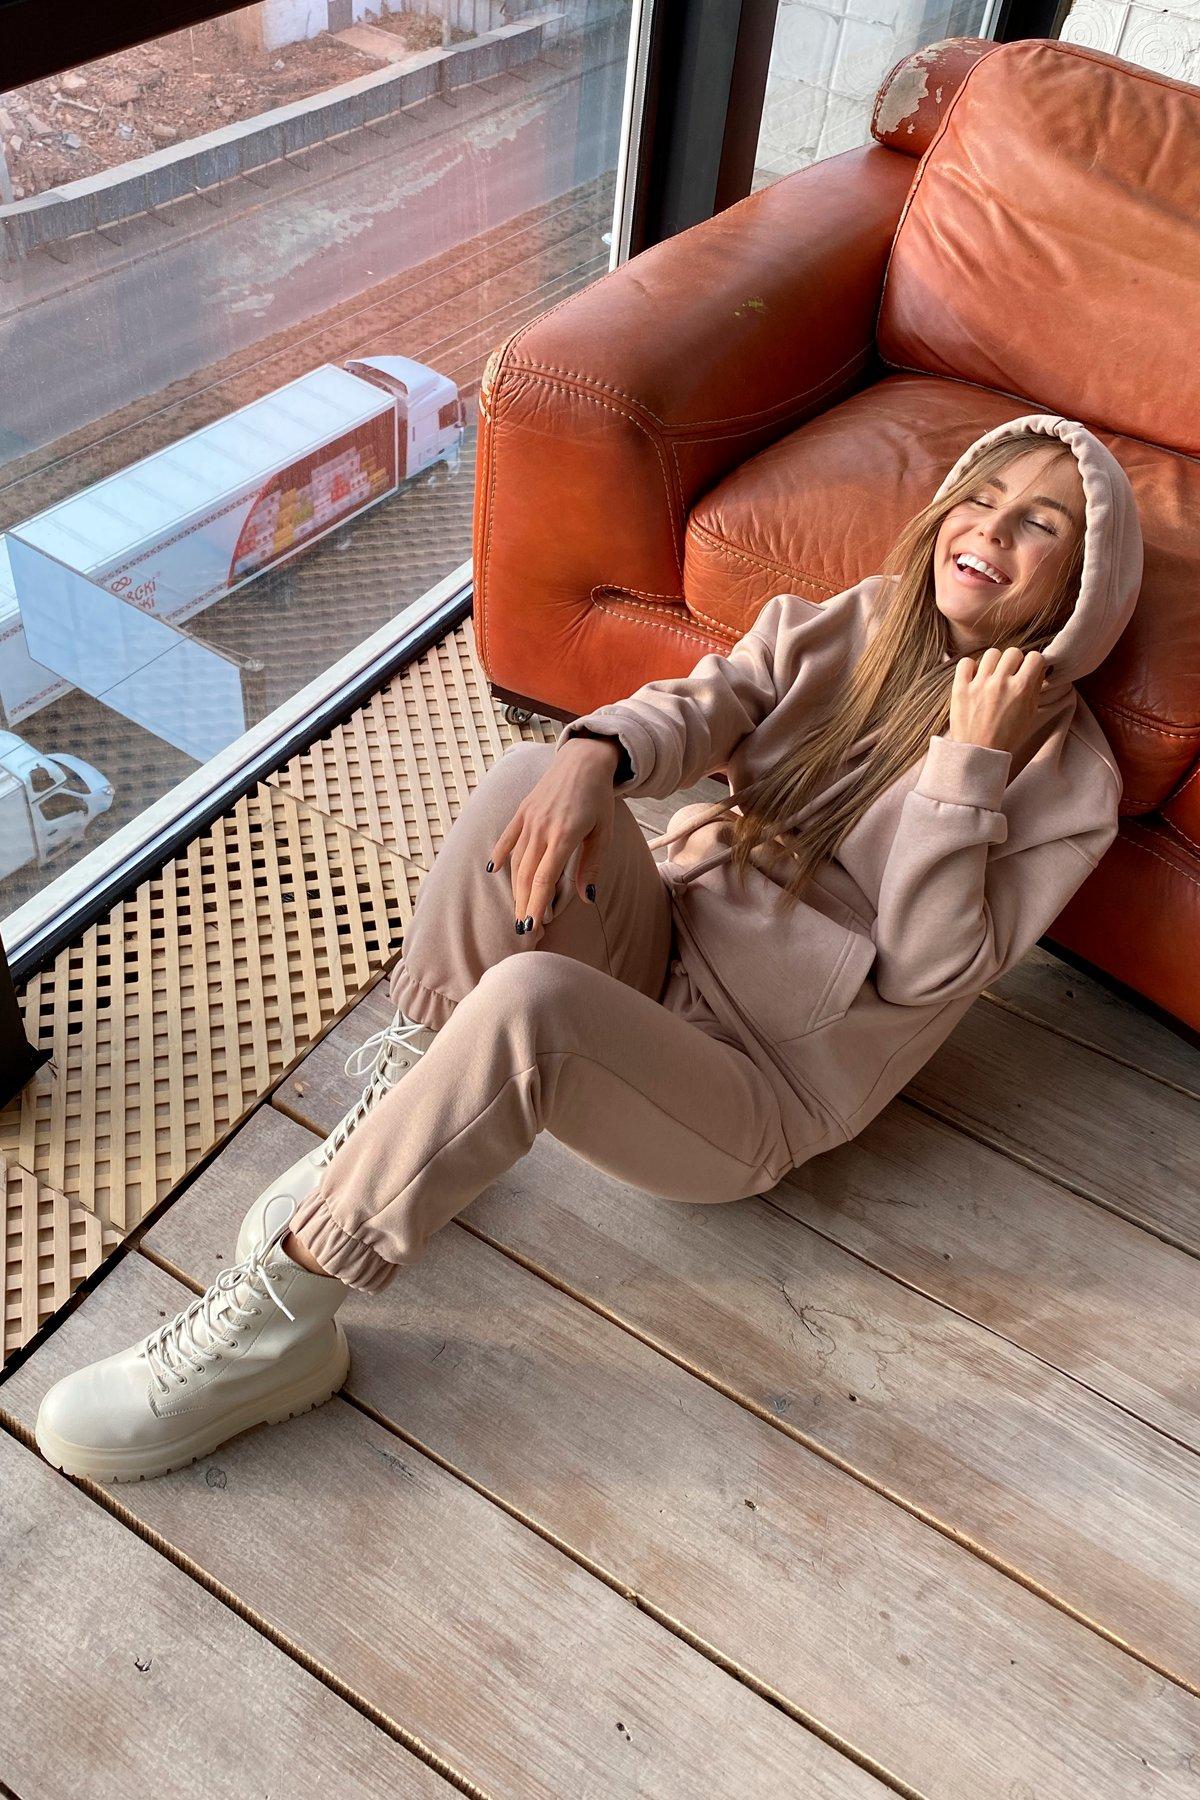 Кул трикотаж 3х нитка с начесом костюм 9981 АРТ. 46268 Цвет: Бежевый - фото 4, интернет магазин tm-modus.ru